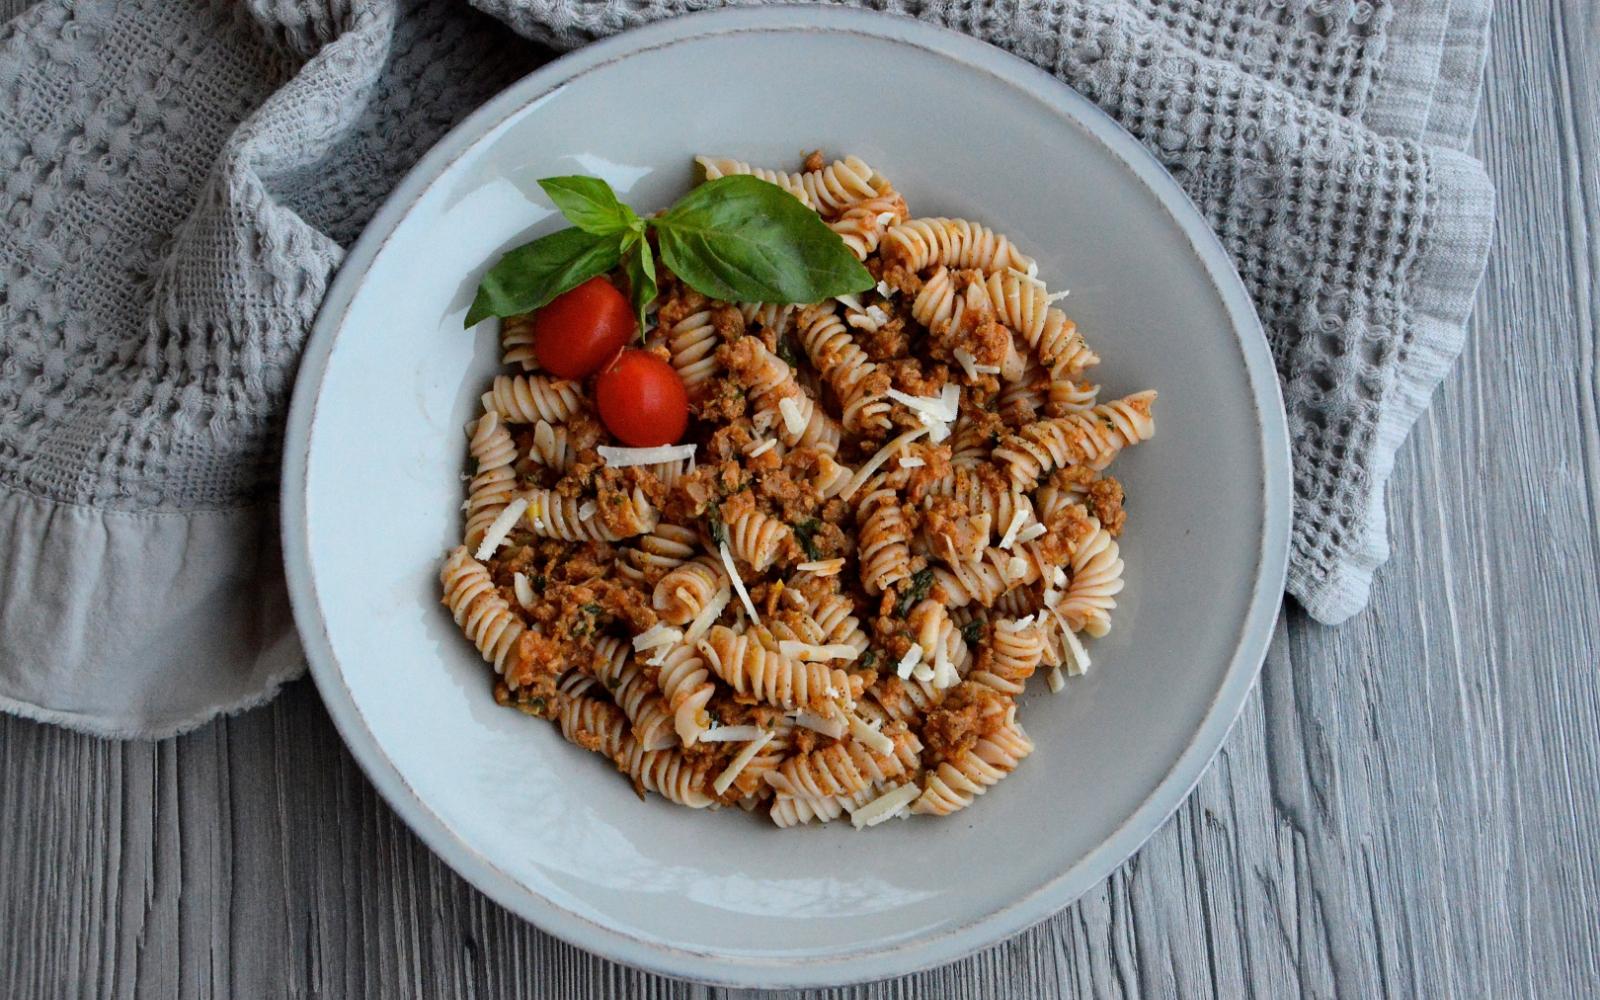 Vegan Beefless Bolognese Sauce